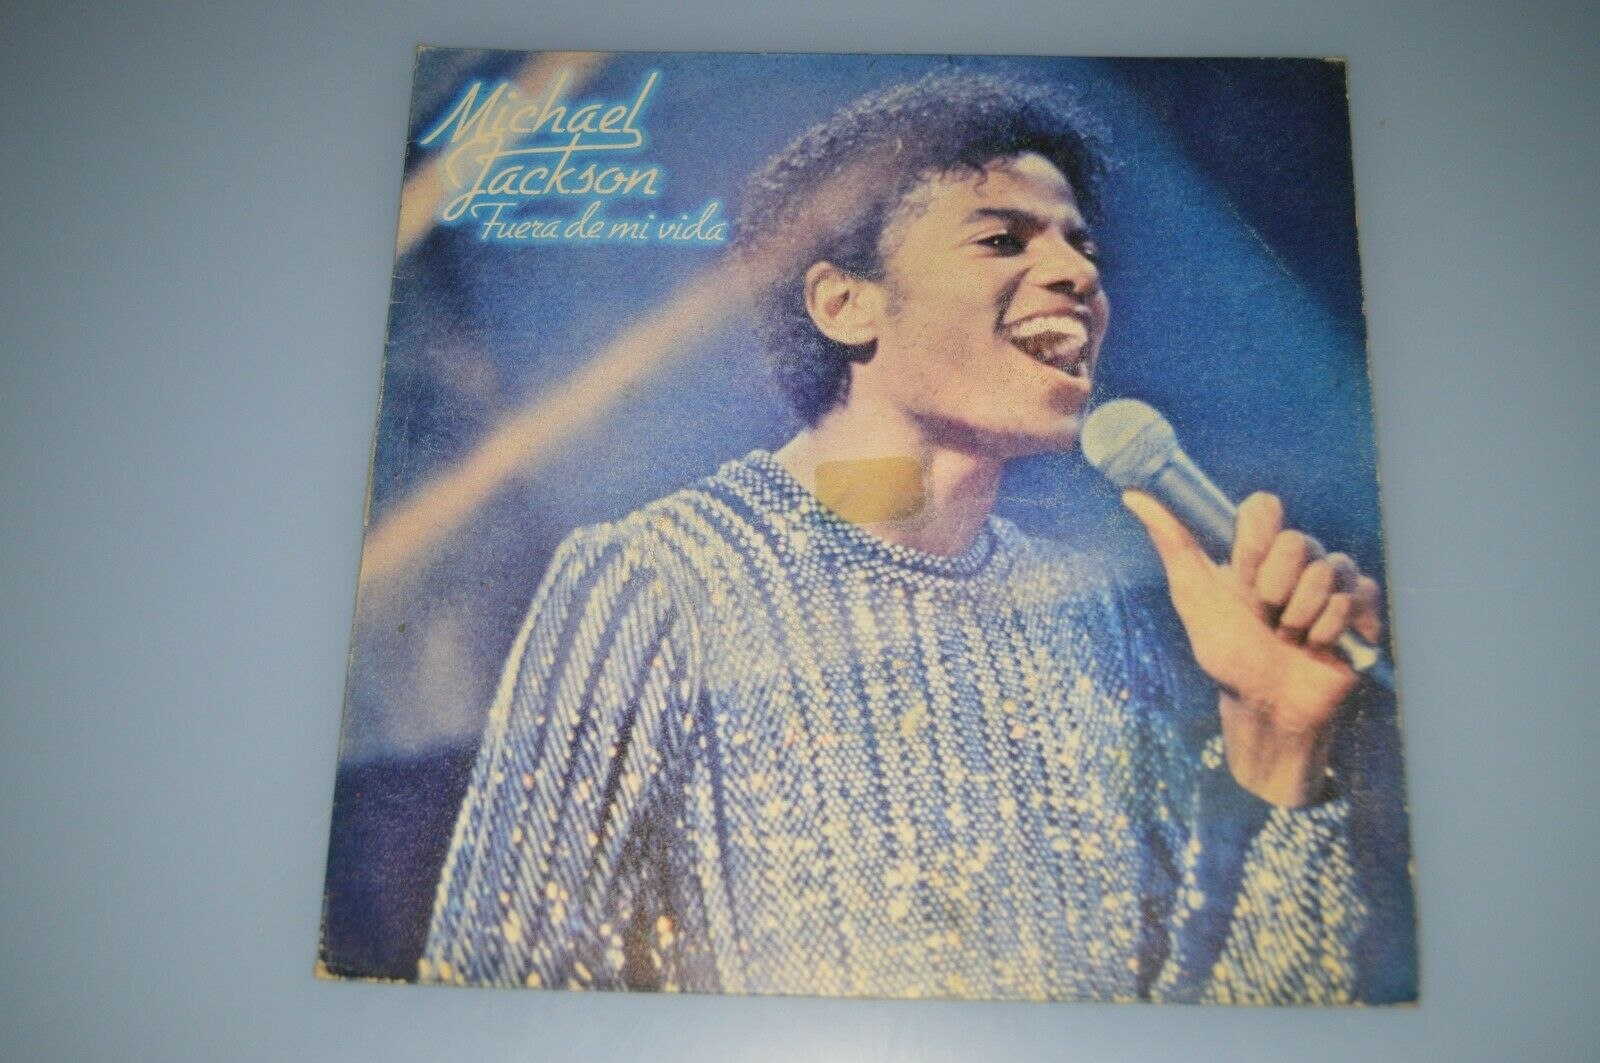 Michael Jackson – Fuera De Mi Vida She's Out Of My Life...